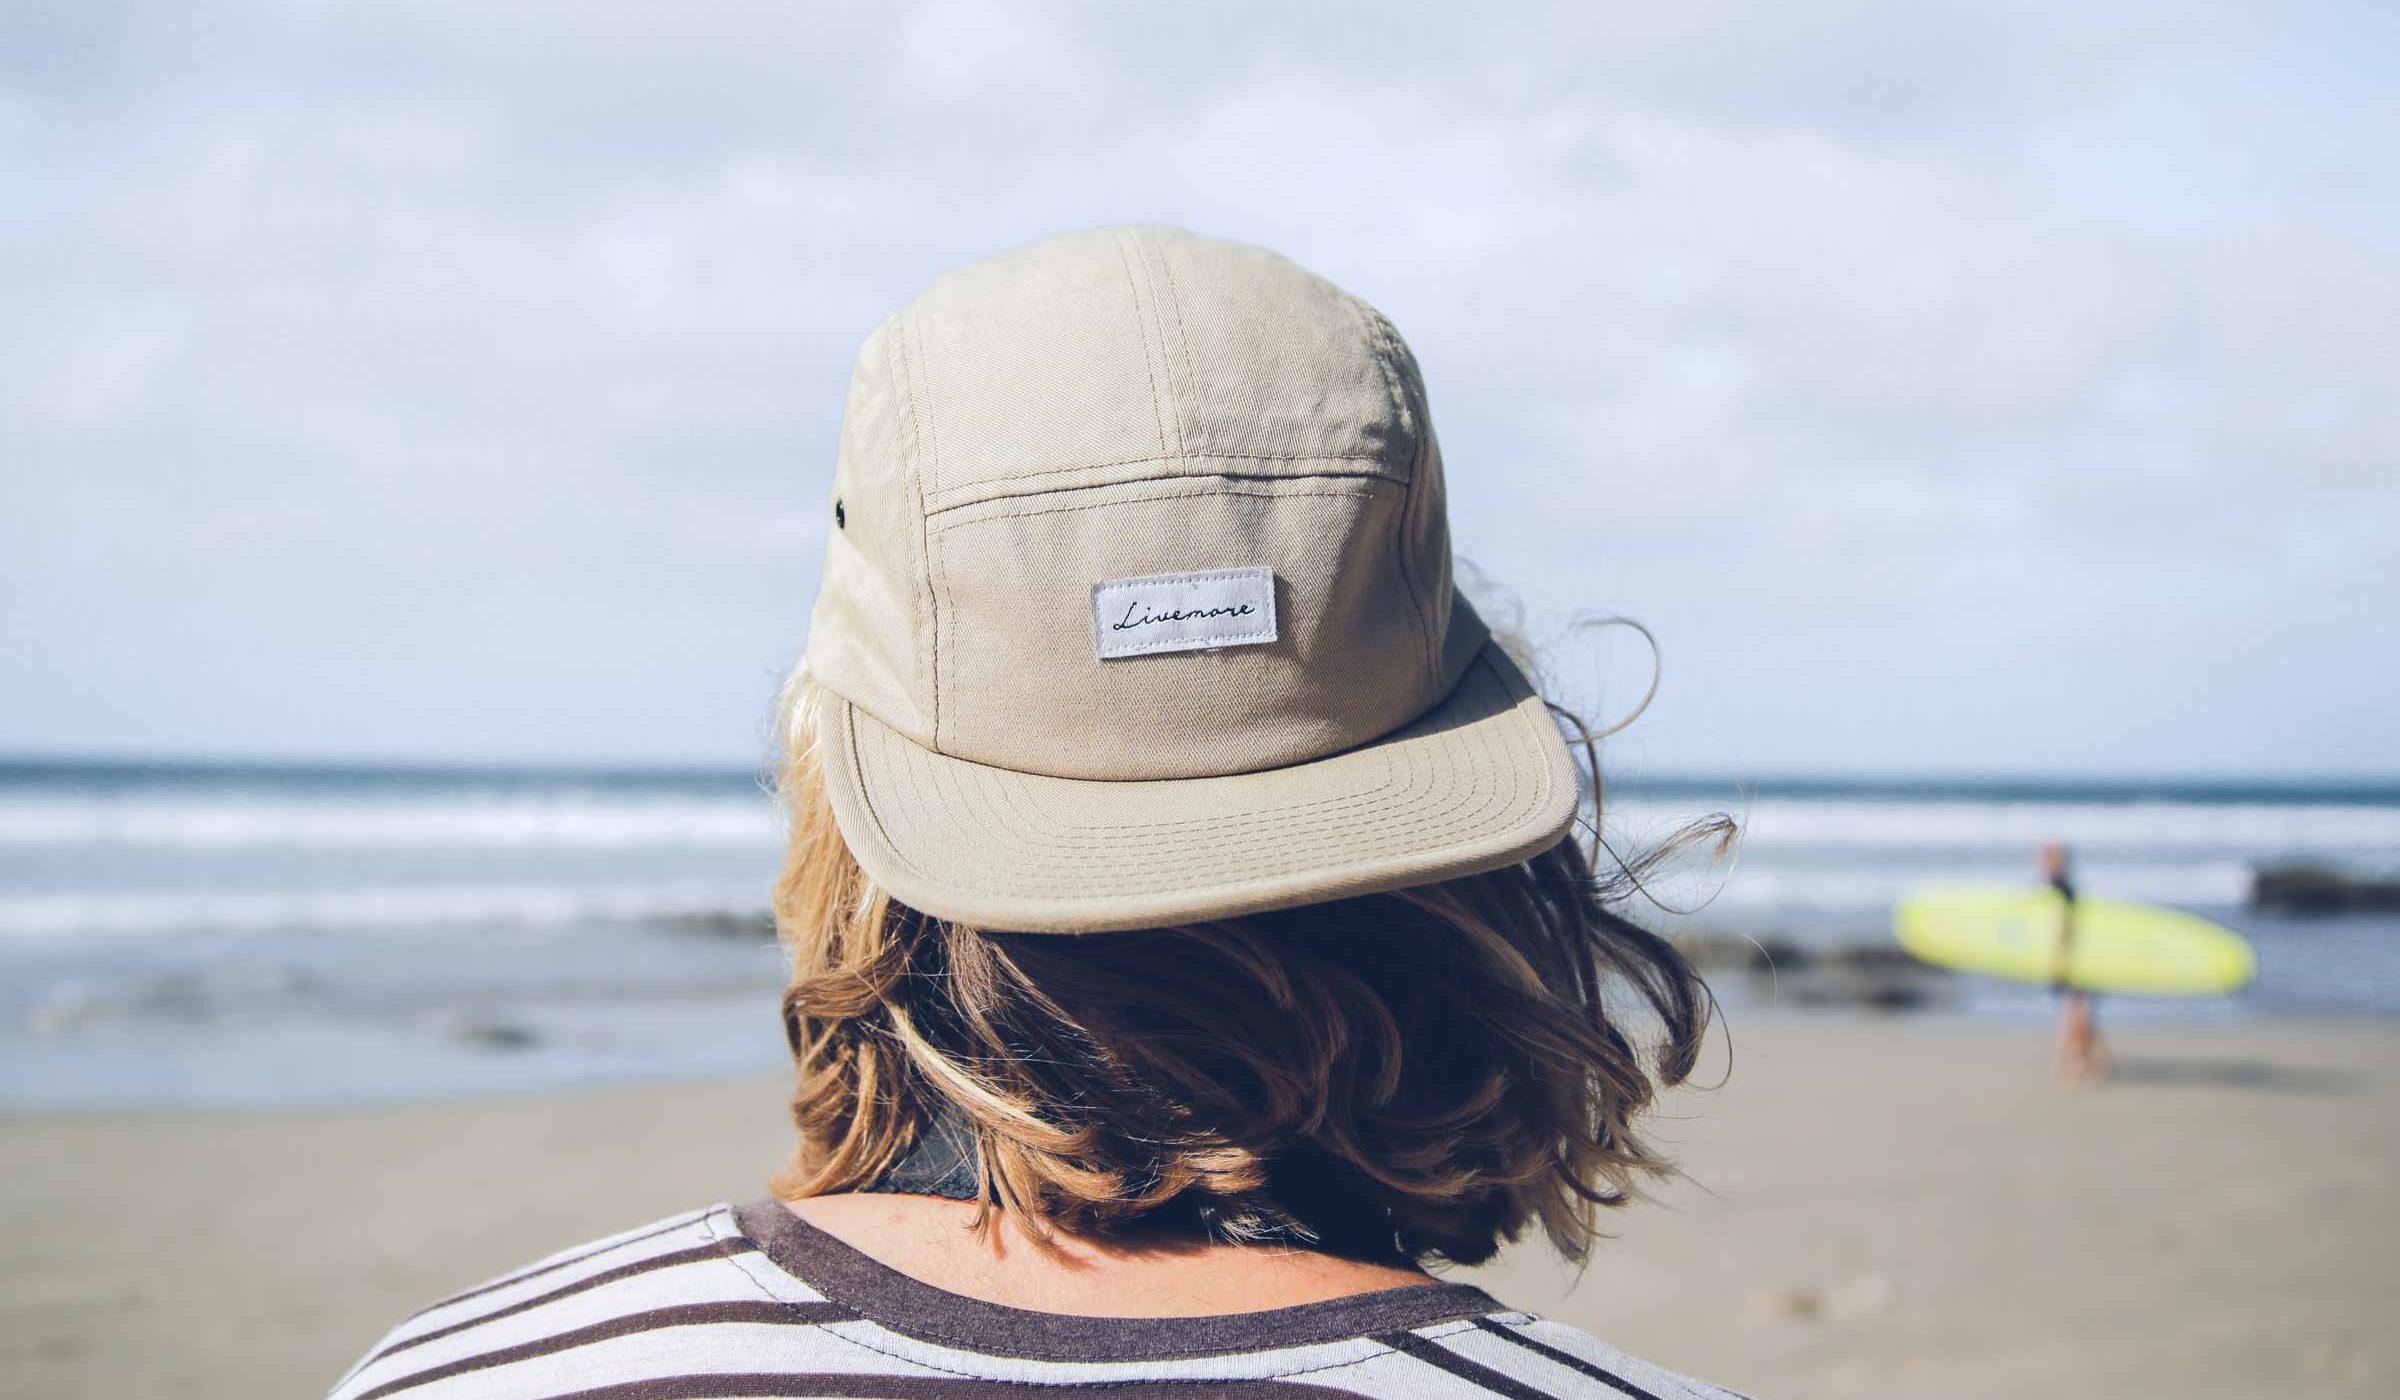 livemore hat